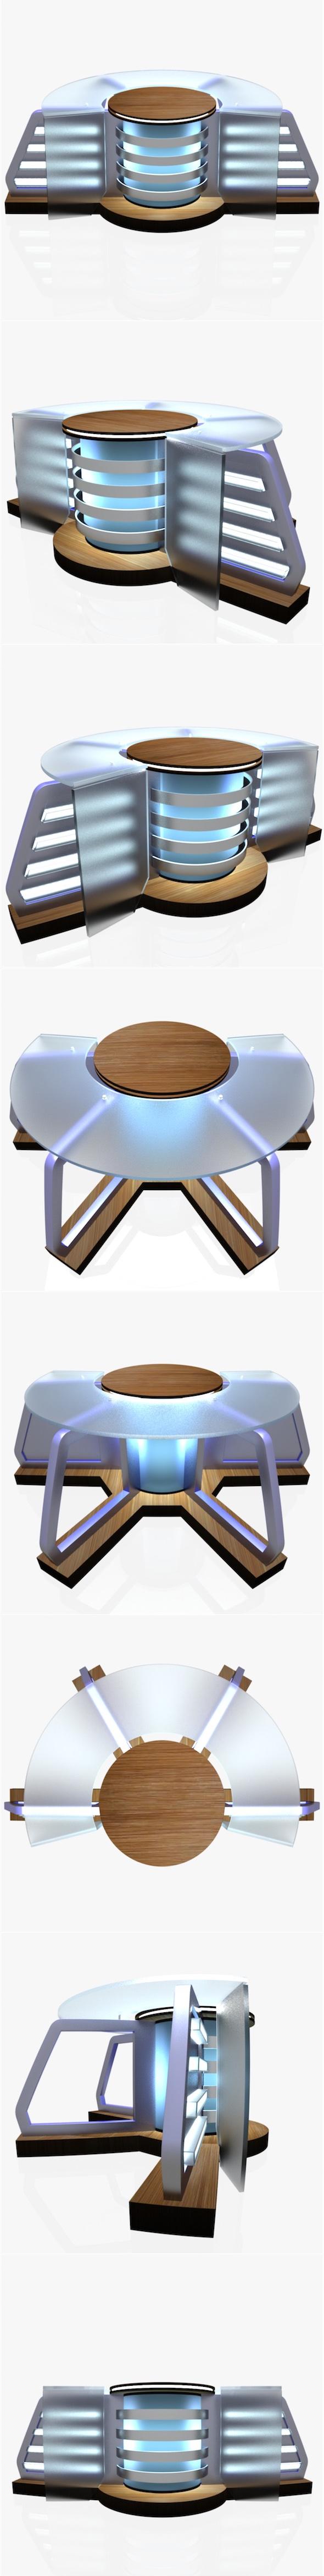 Virtual Tv Studio News Desk 8 - 3DOcean Item for Sale